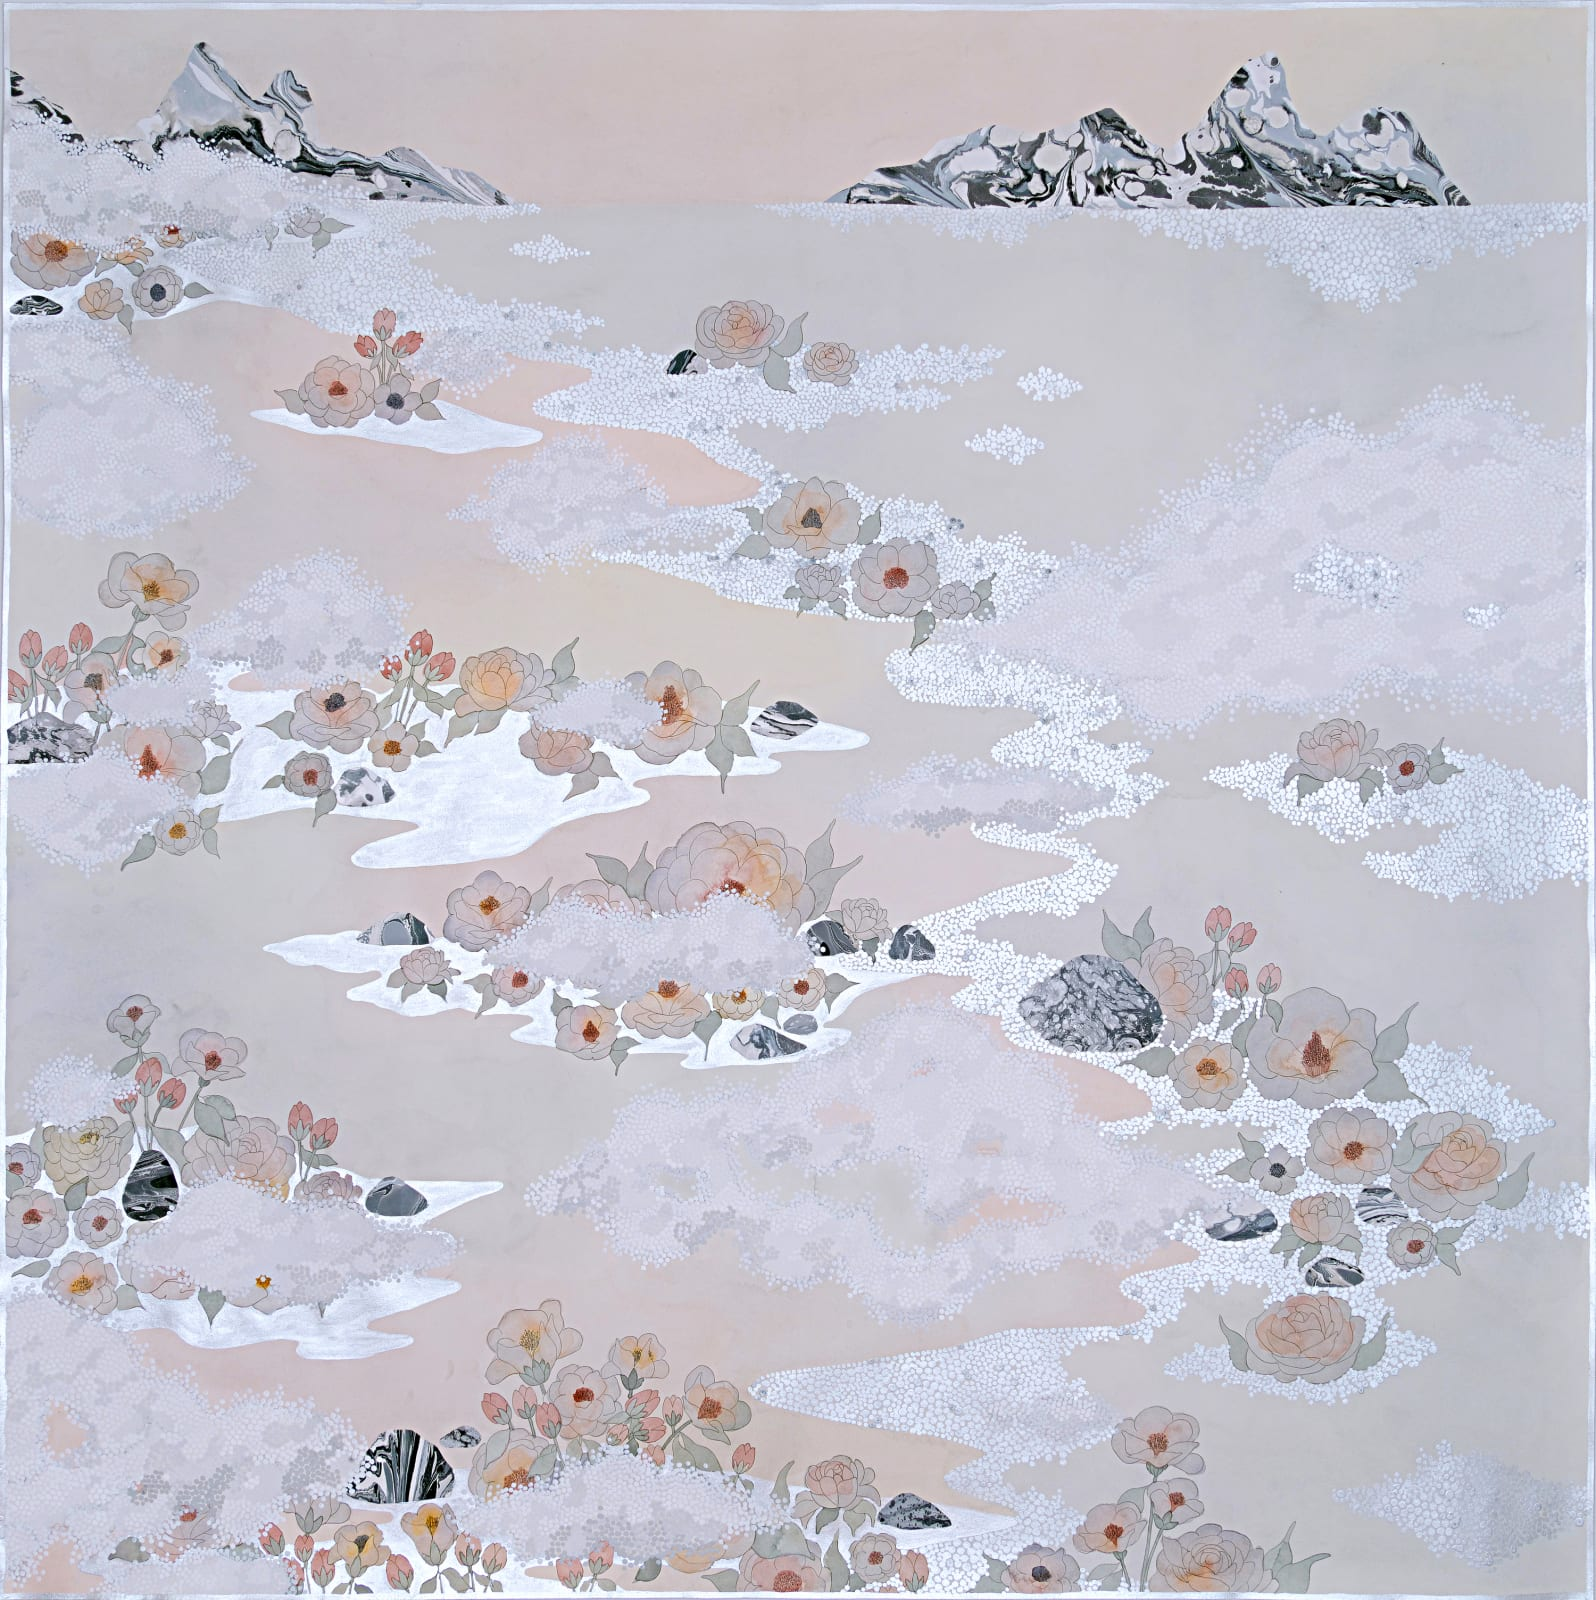 Crystal Liu, the fog, 'like the lulling waves', 2019